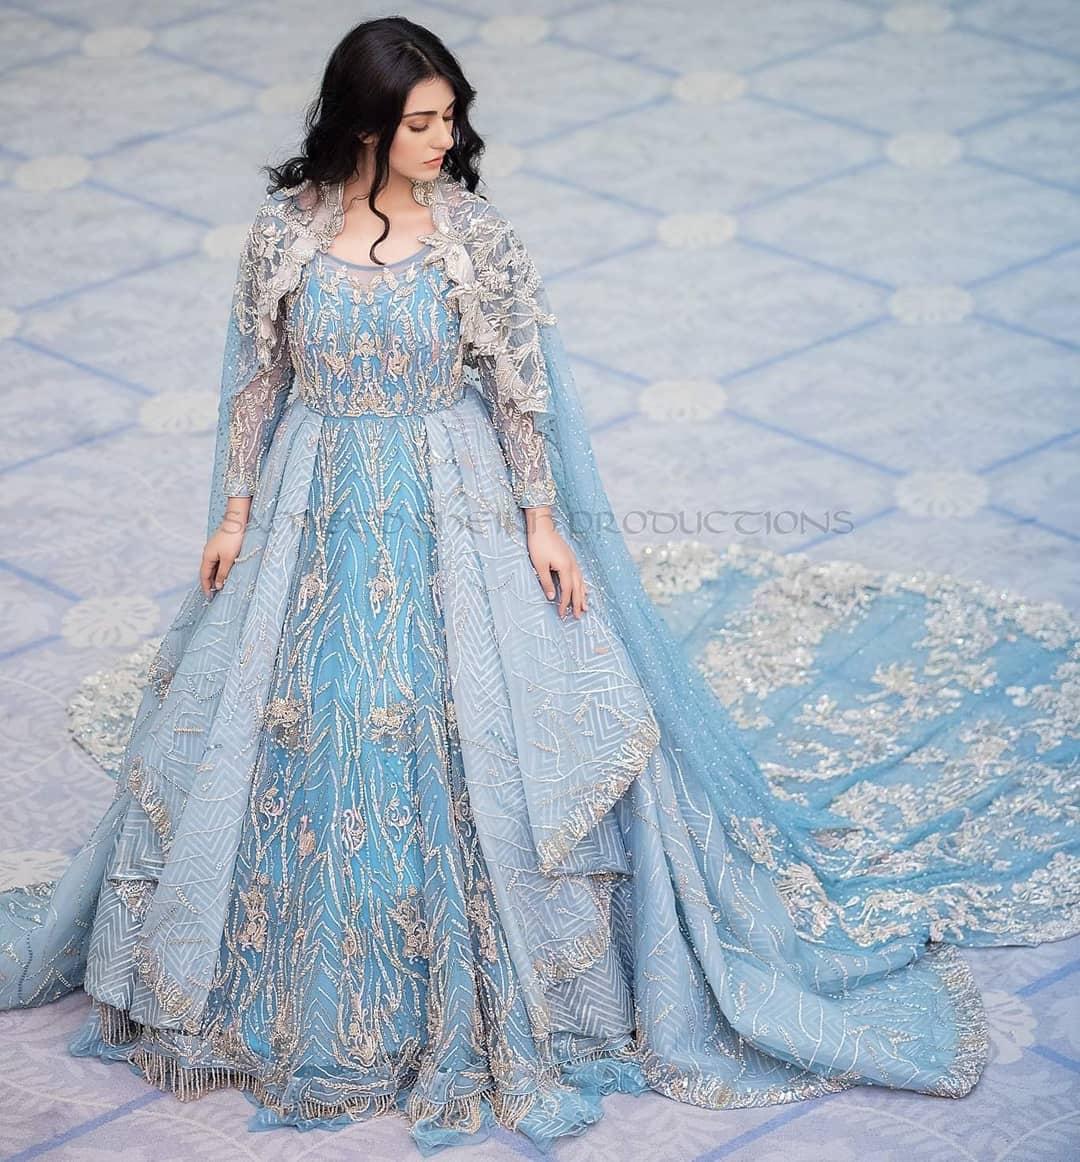 Pakistani Model Sarah Khan Photoshoot (13)